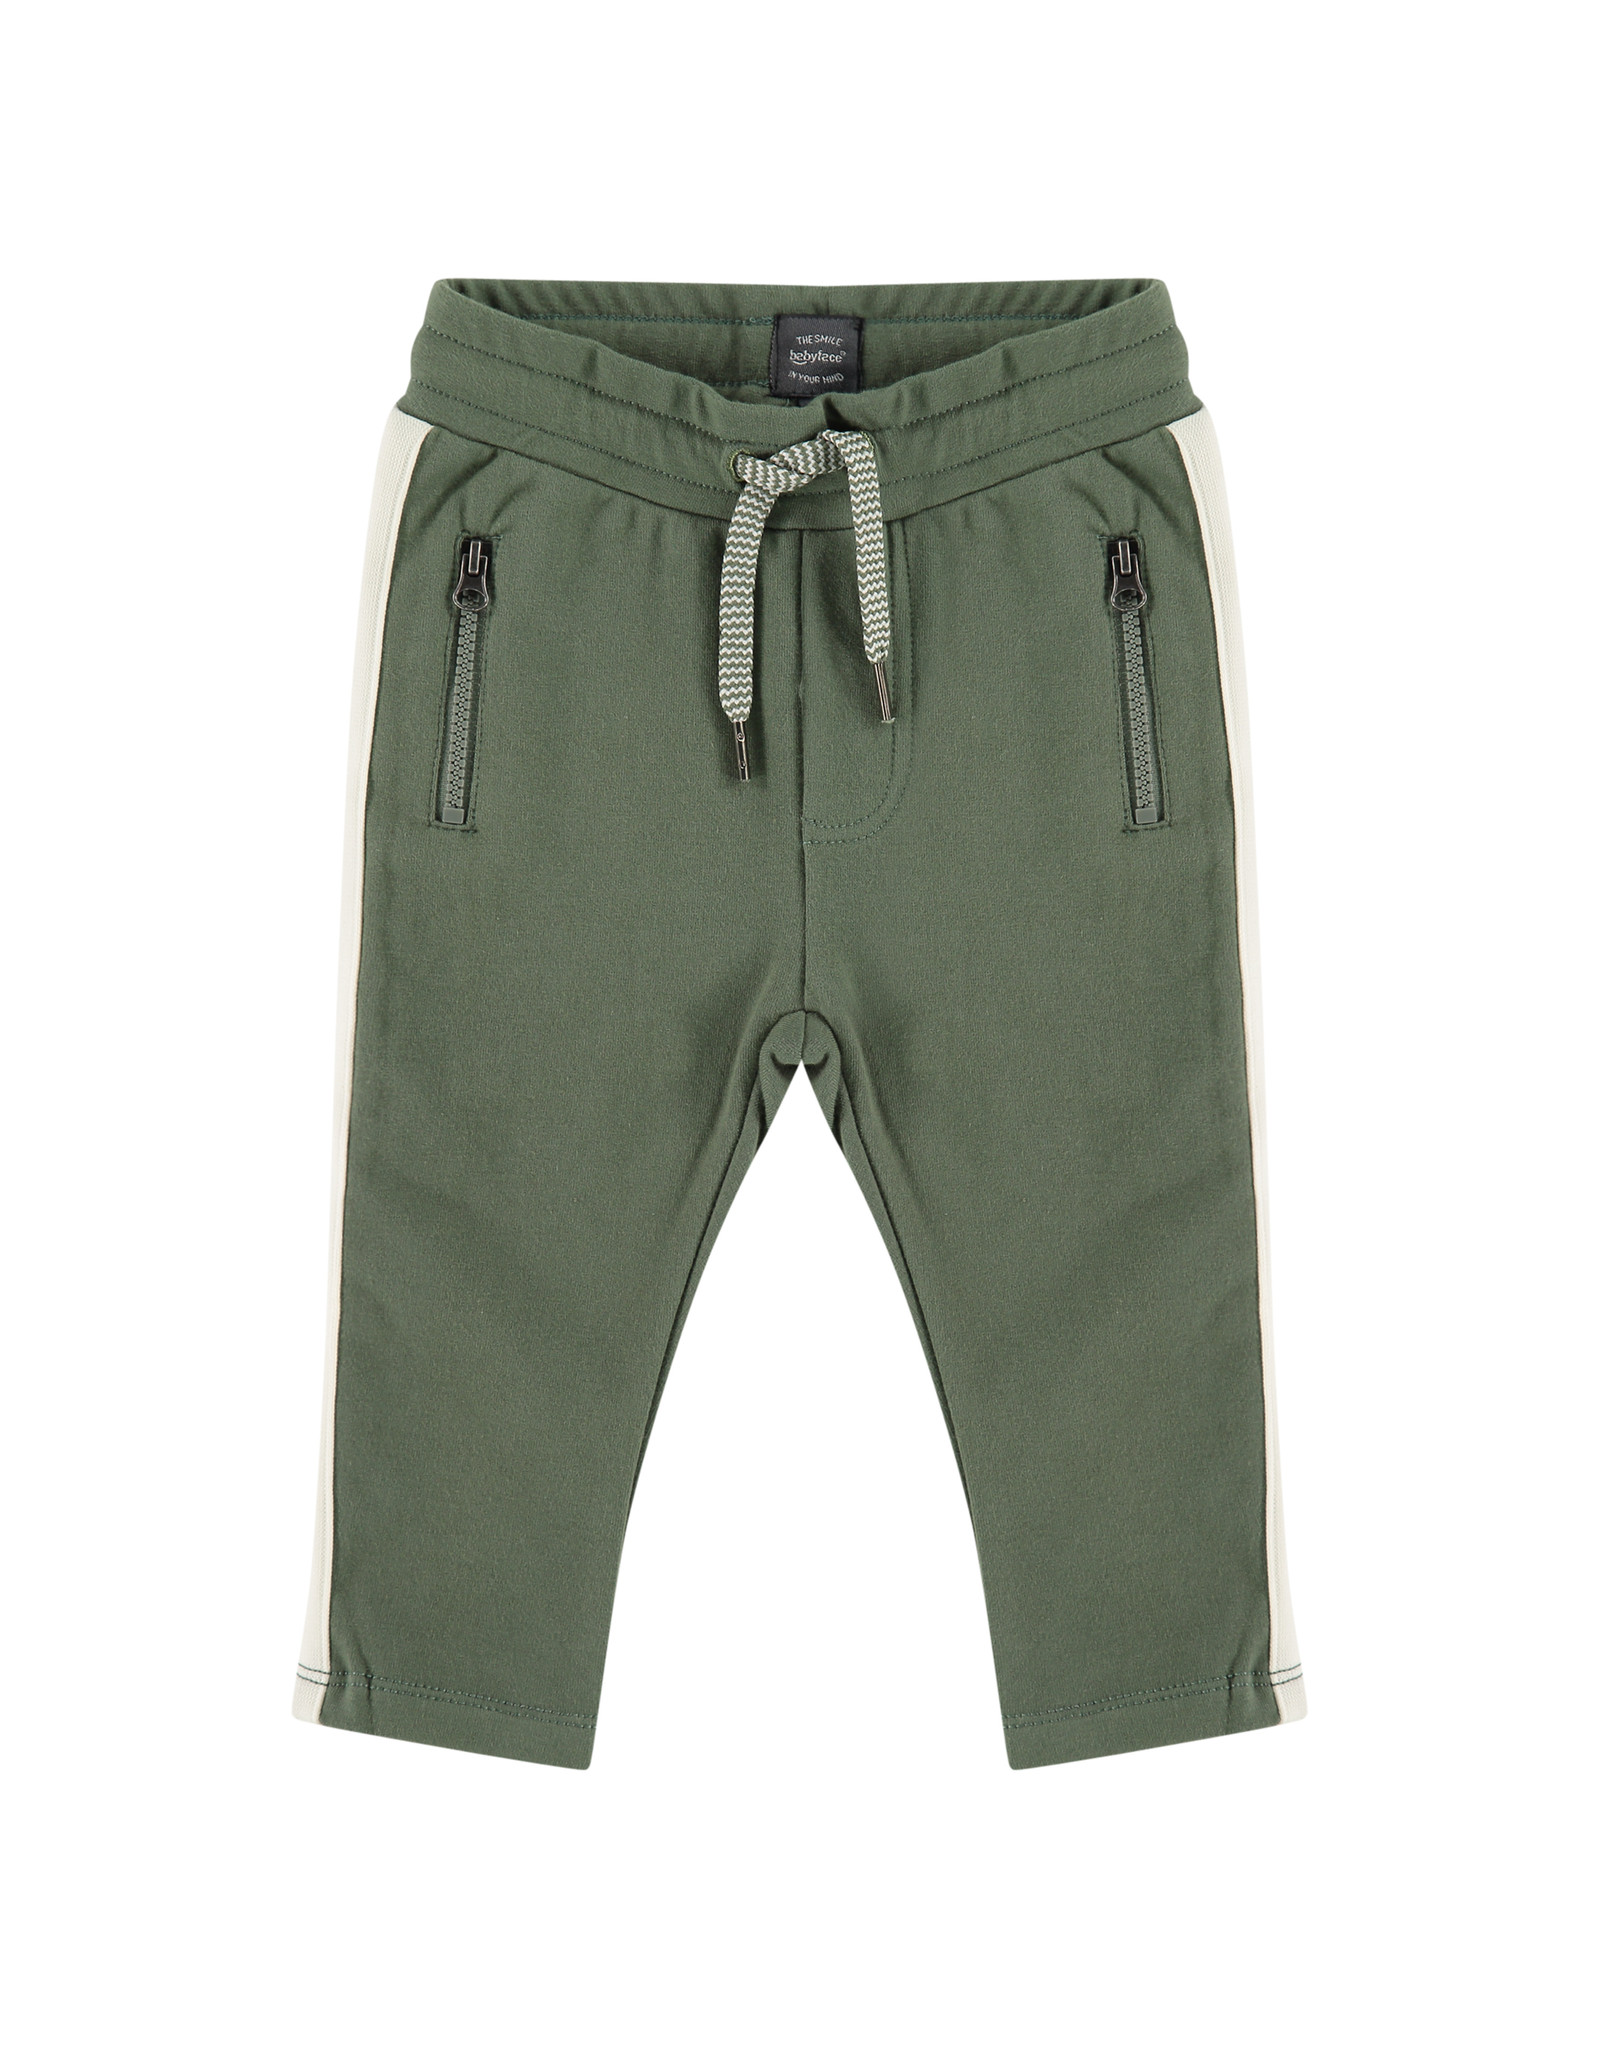 Babyface boys sweatpants, army, BBE21107209